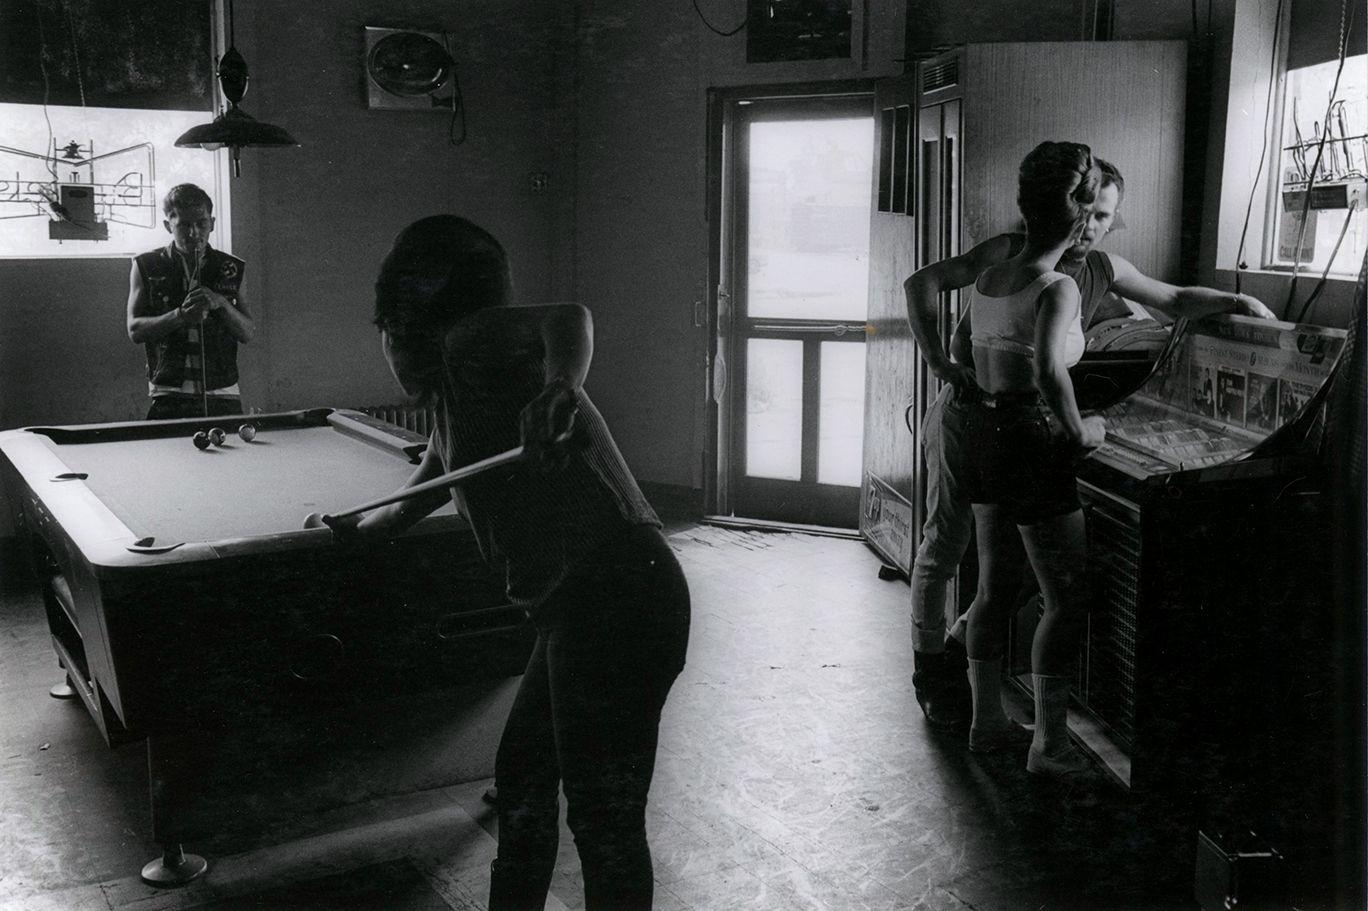 Copyright Danny Lyon / Magnum Photos, N.Y. Eddie's, Chicago, from The Bikeriders, 1966